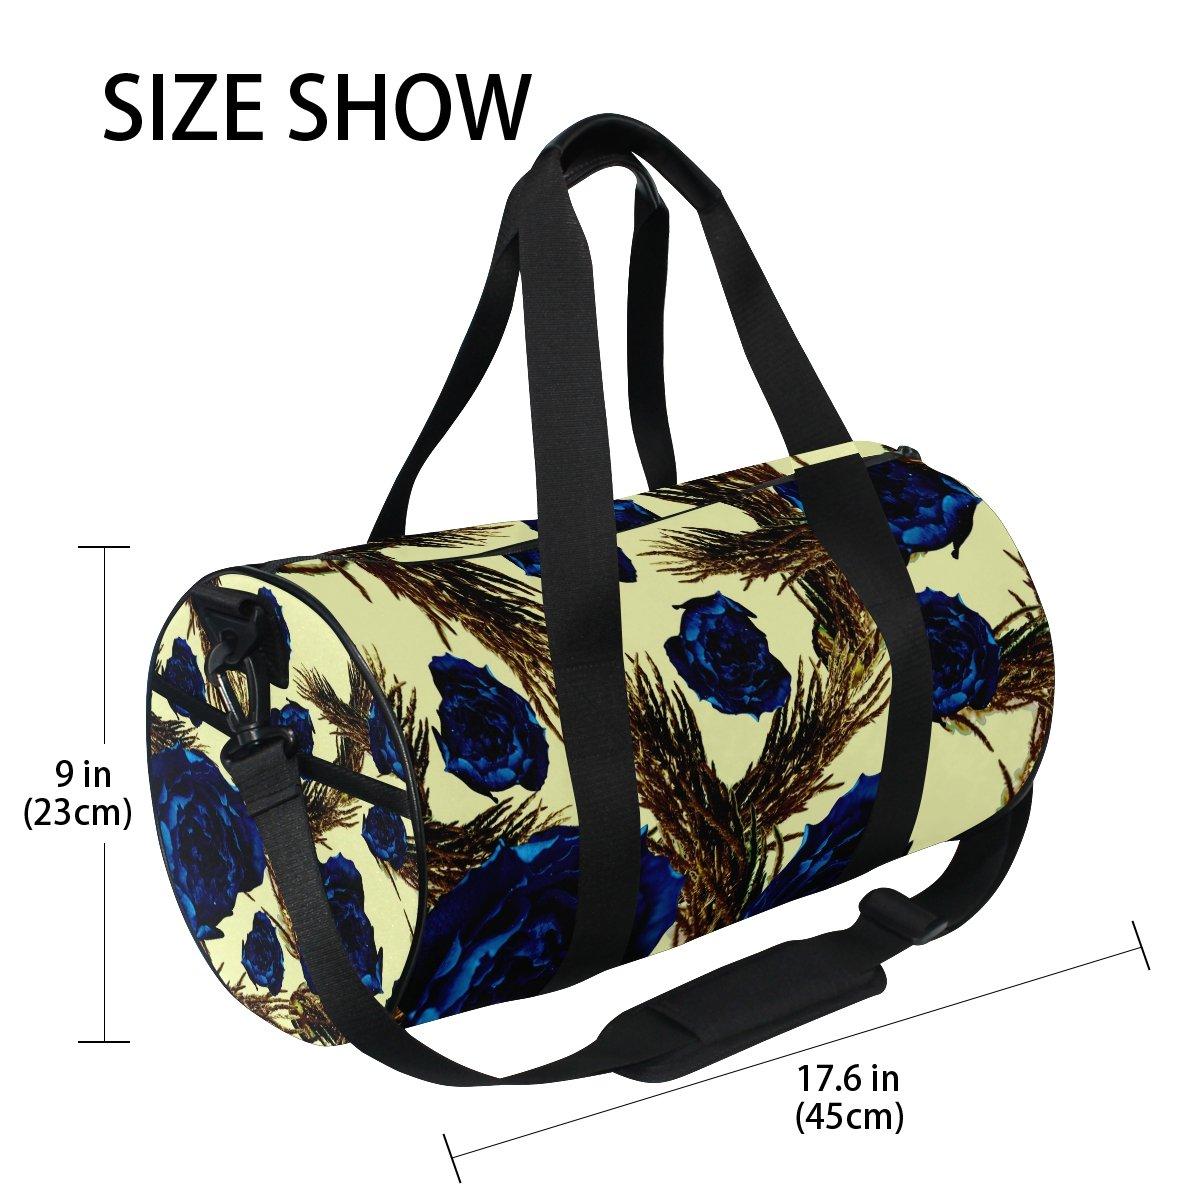 Gym Bag Blue Rose Sports Travel Duffel Lightweight Canvas Bags